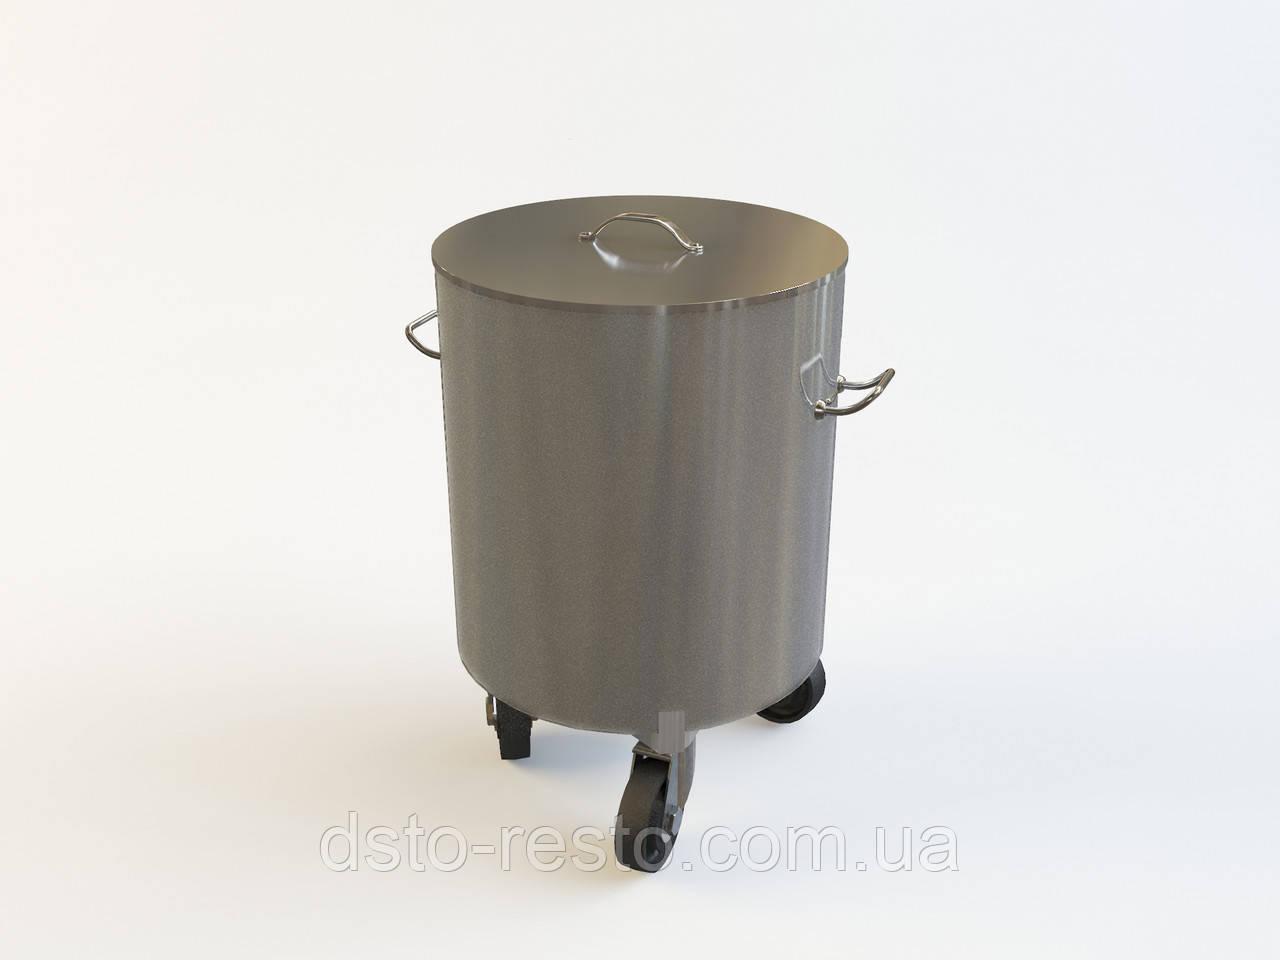 Бак для сбора отходов на 50 л